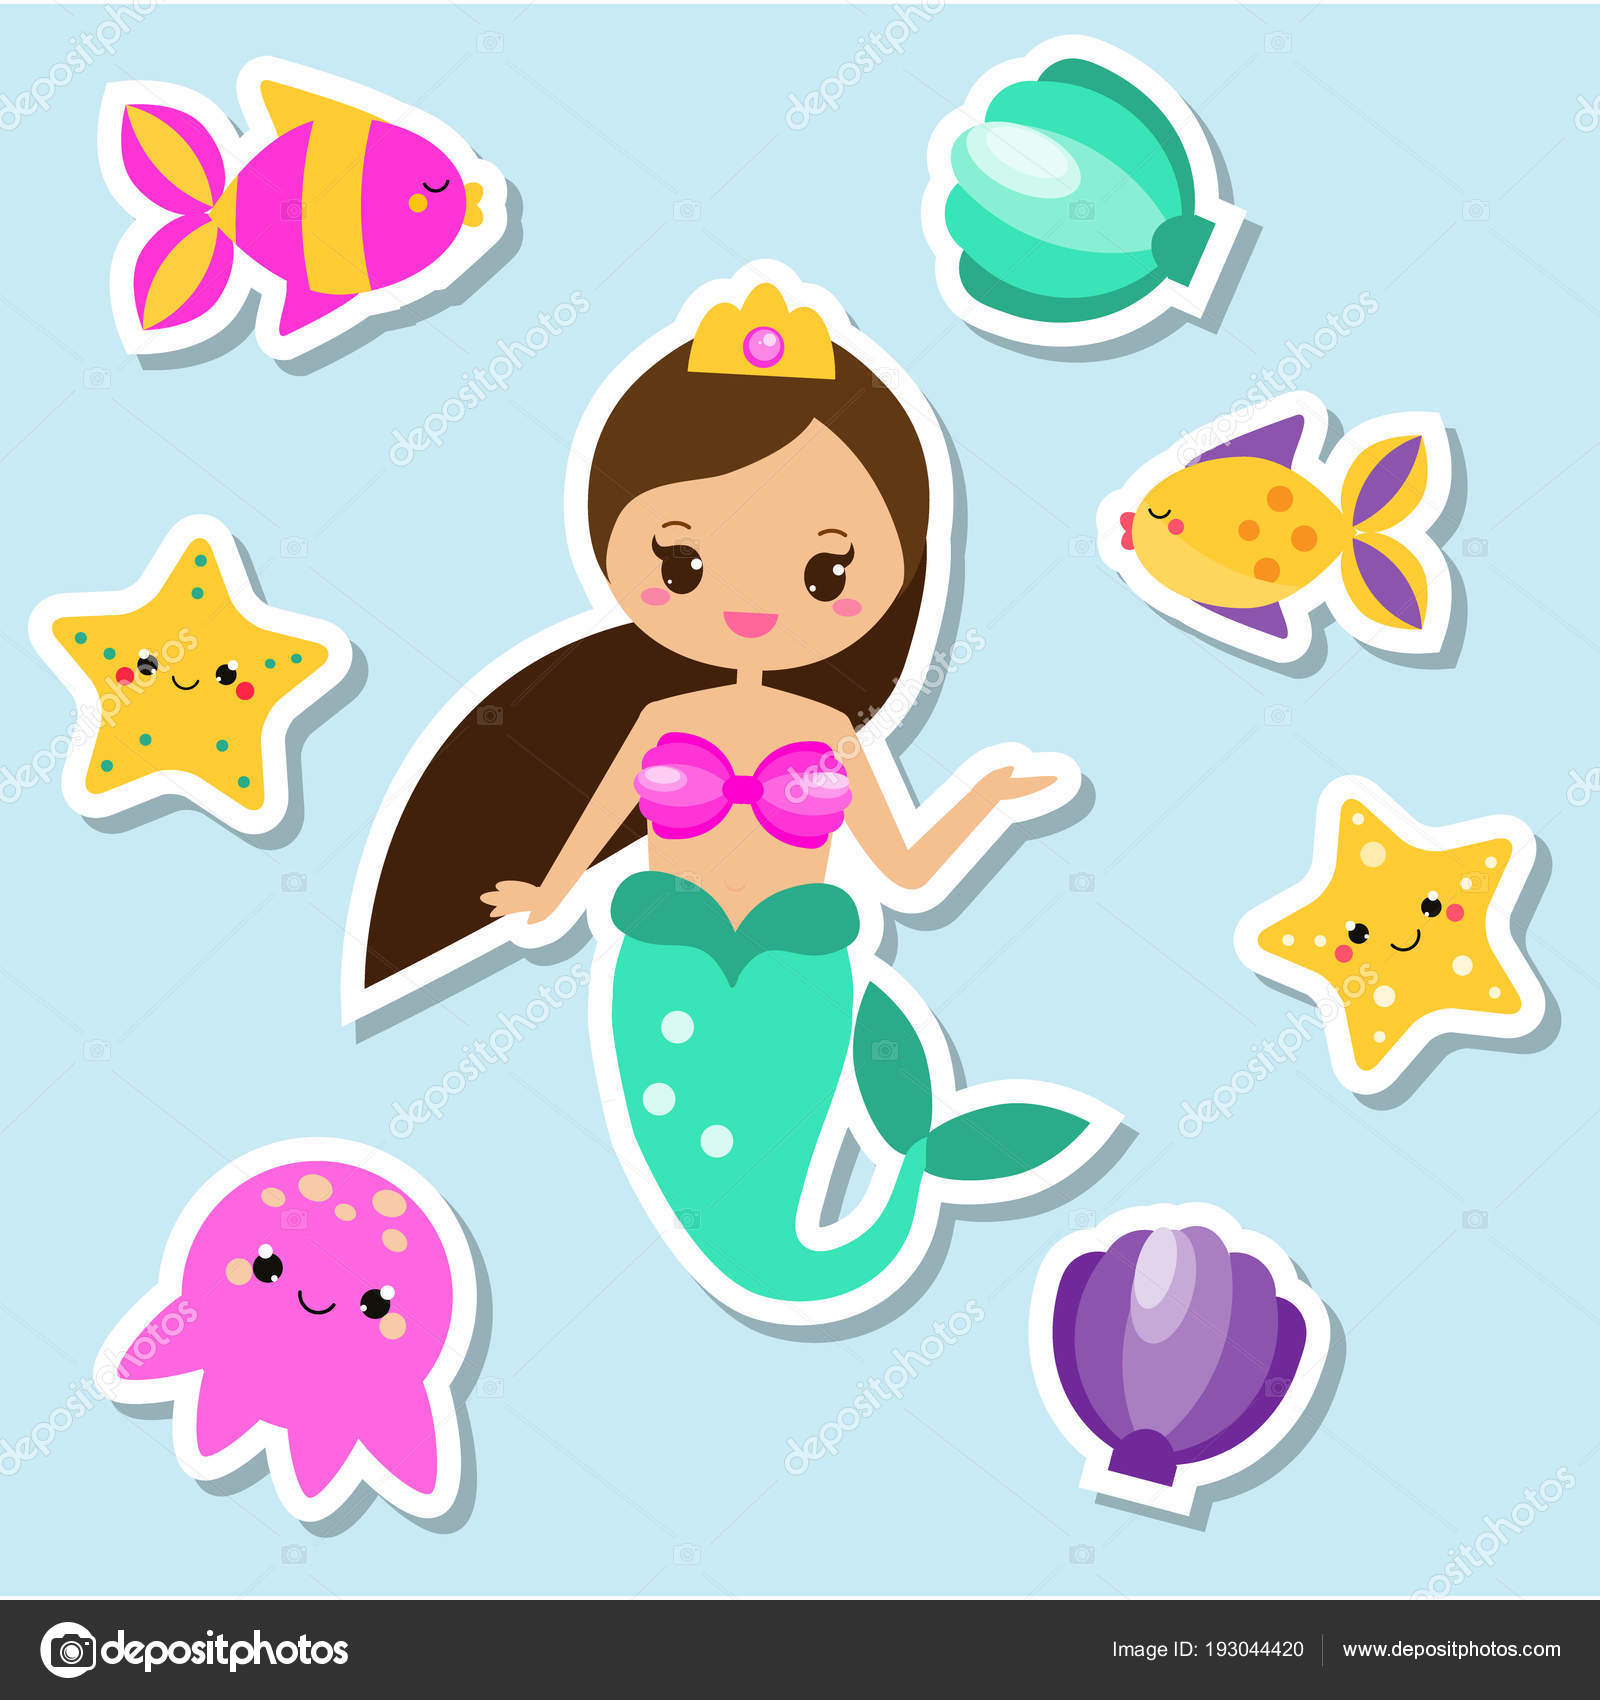 Set Adesivi Sirena Elementi Fata Scrapbook Kids Design Bambini